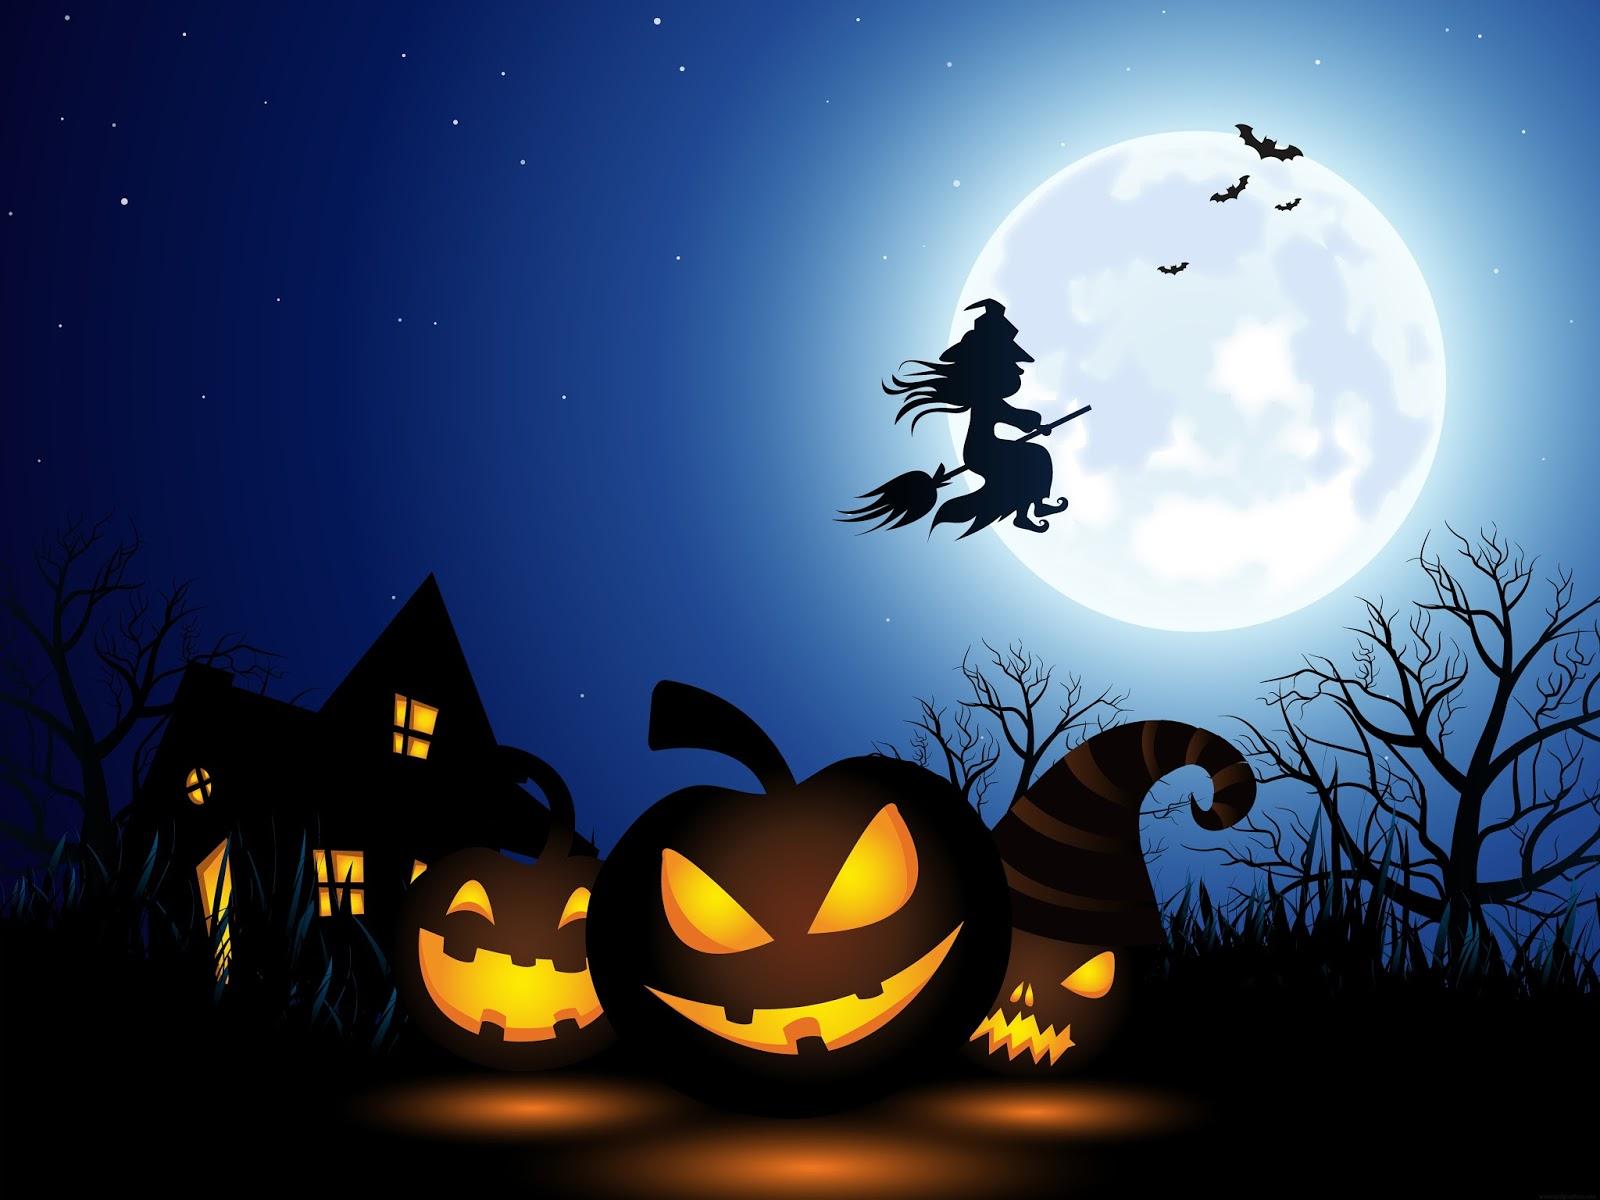 Halloween Wallpapers - Free Halloween Wallpapers: Funny ...